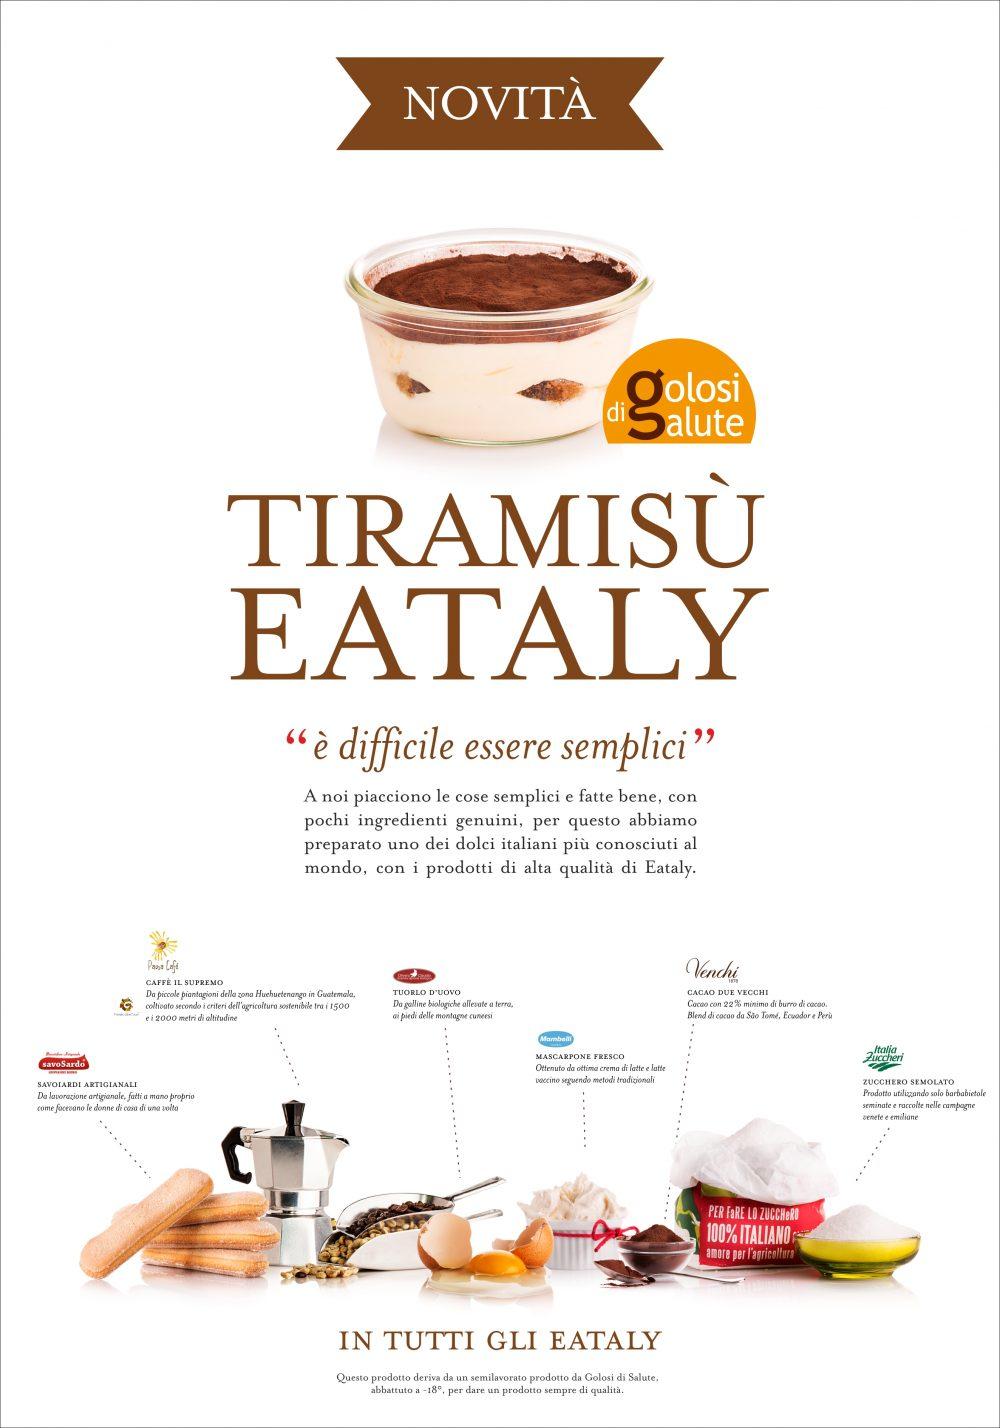 Tiramisu Eataly 2018